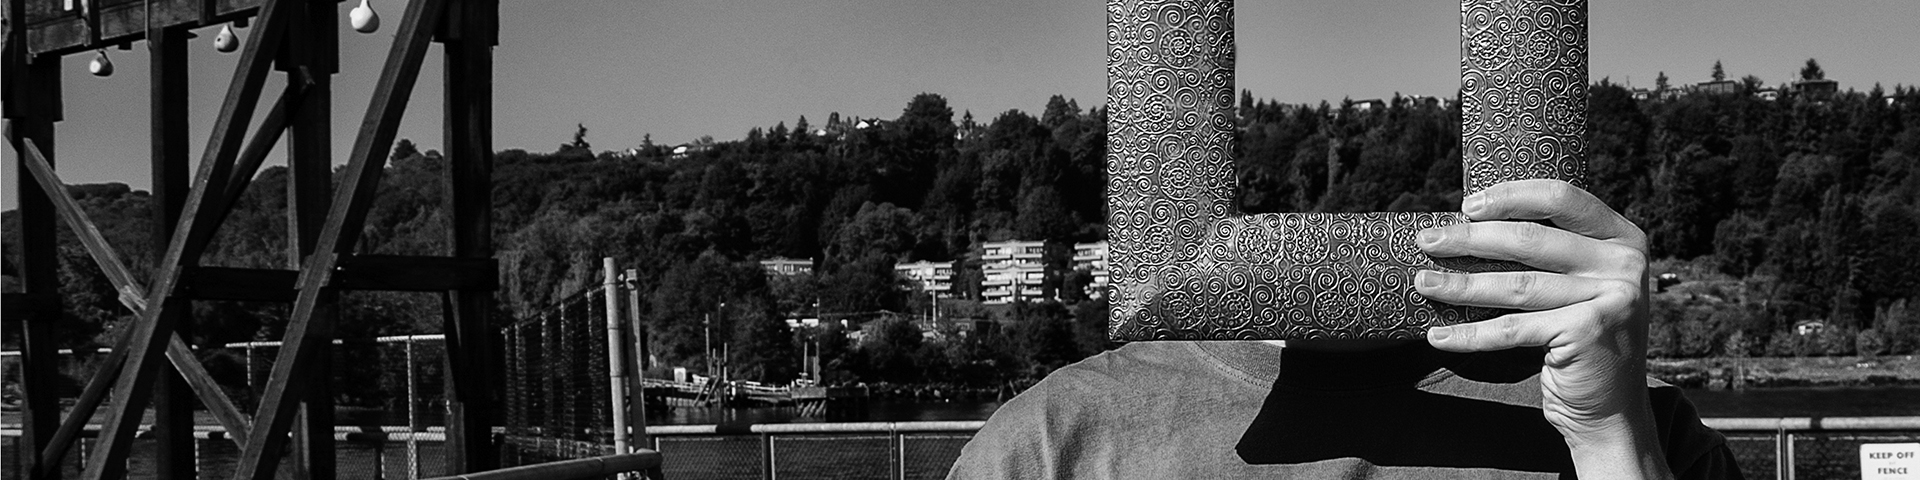 Oliver H., Youth in Focus alumnus